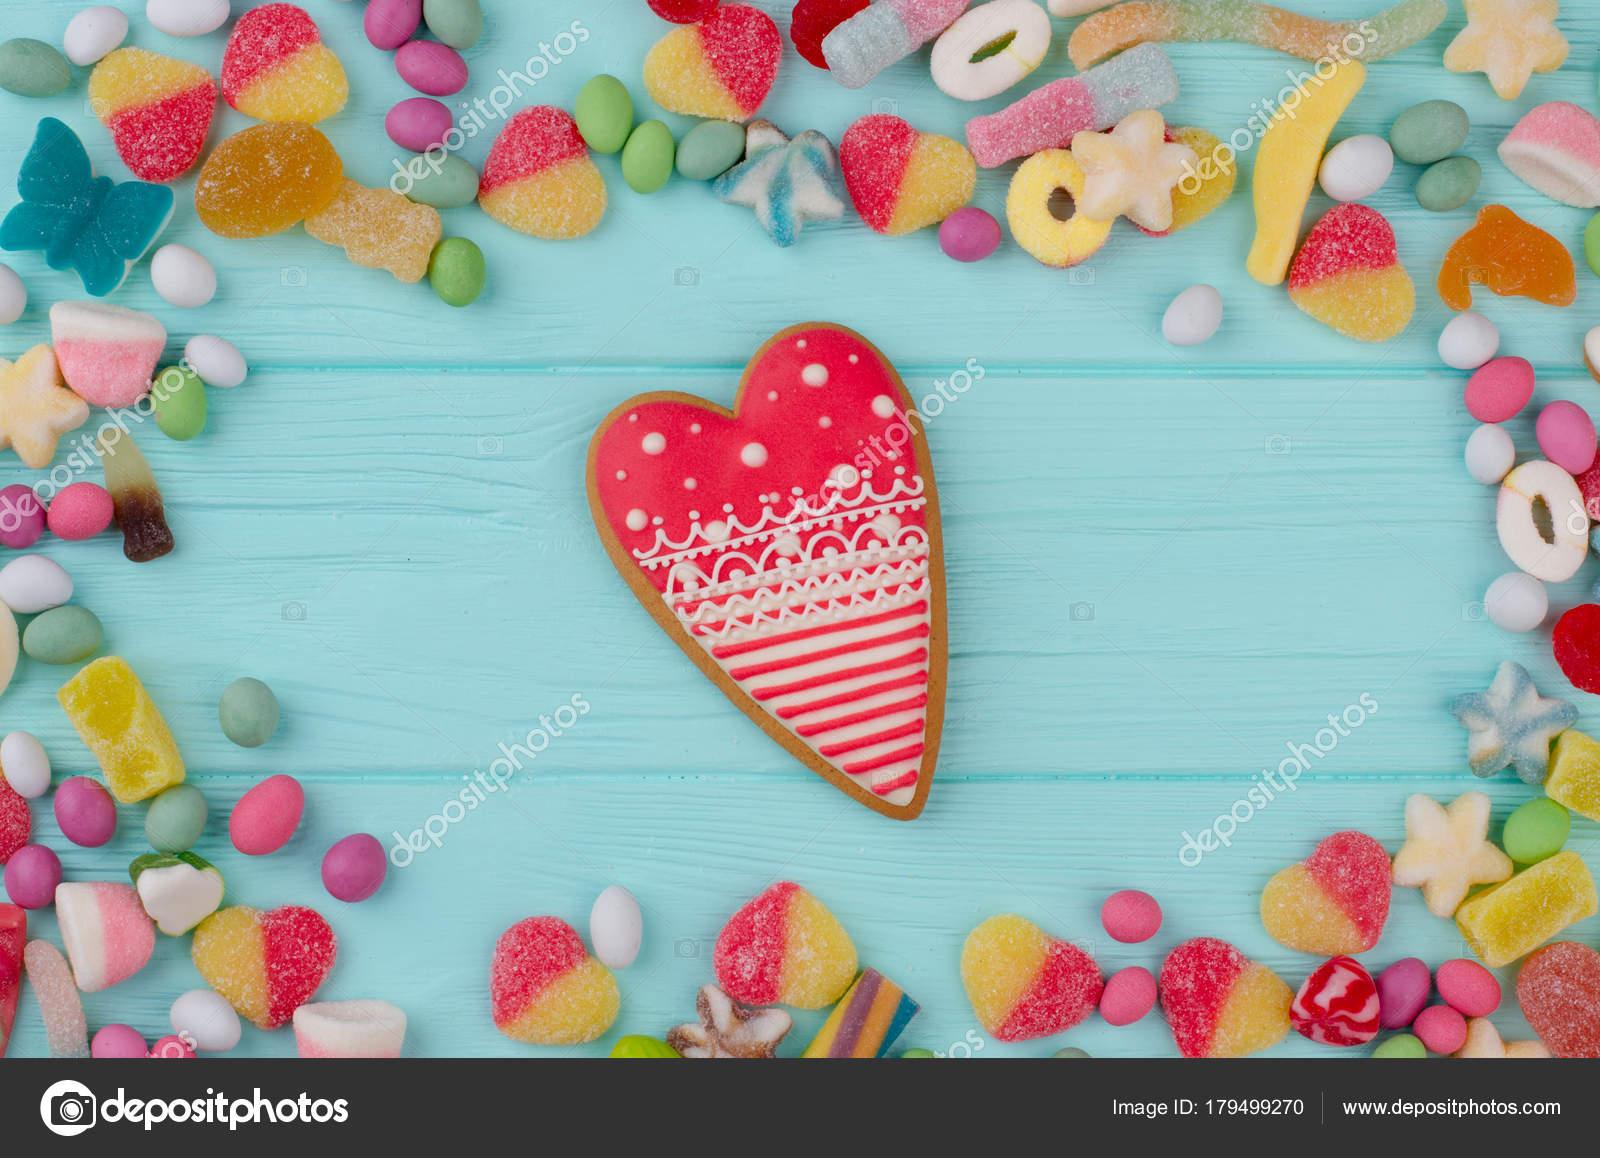 Marco con dulces, fondo madera — Fotos de Stock © Denisfilm #179499270